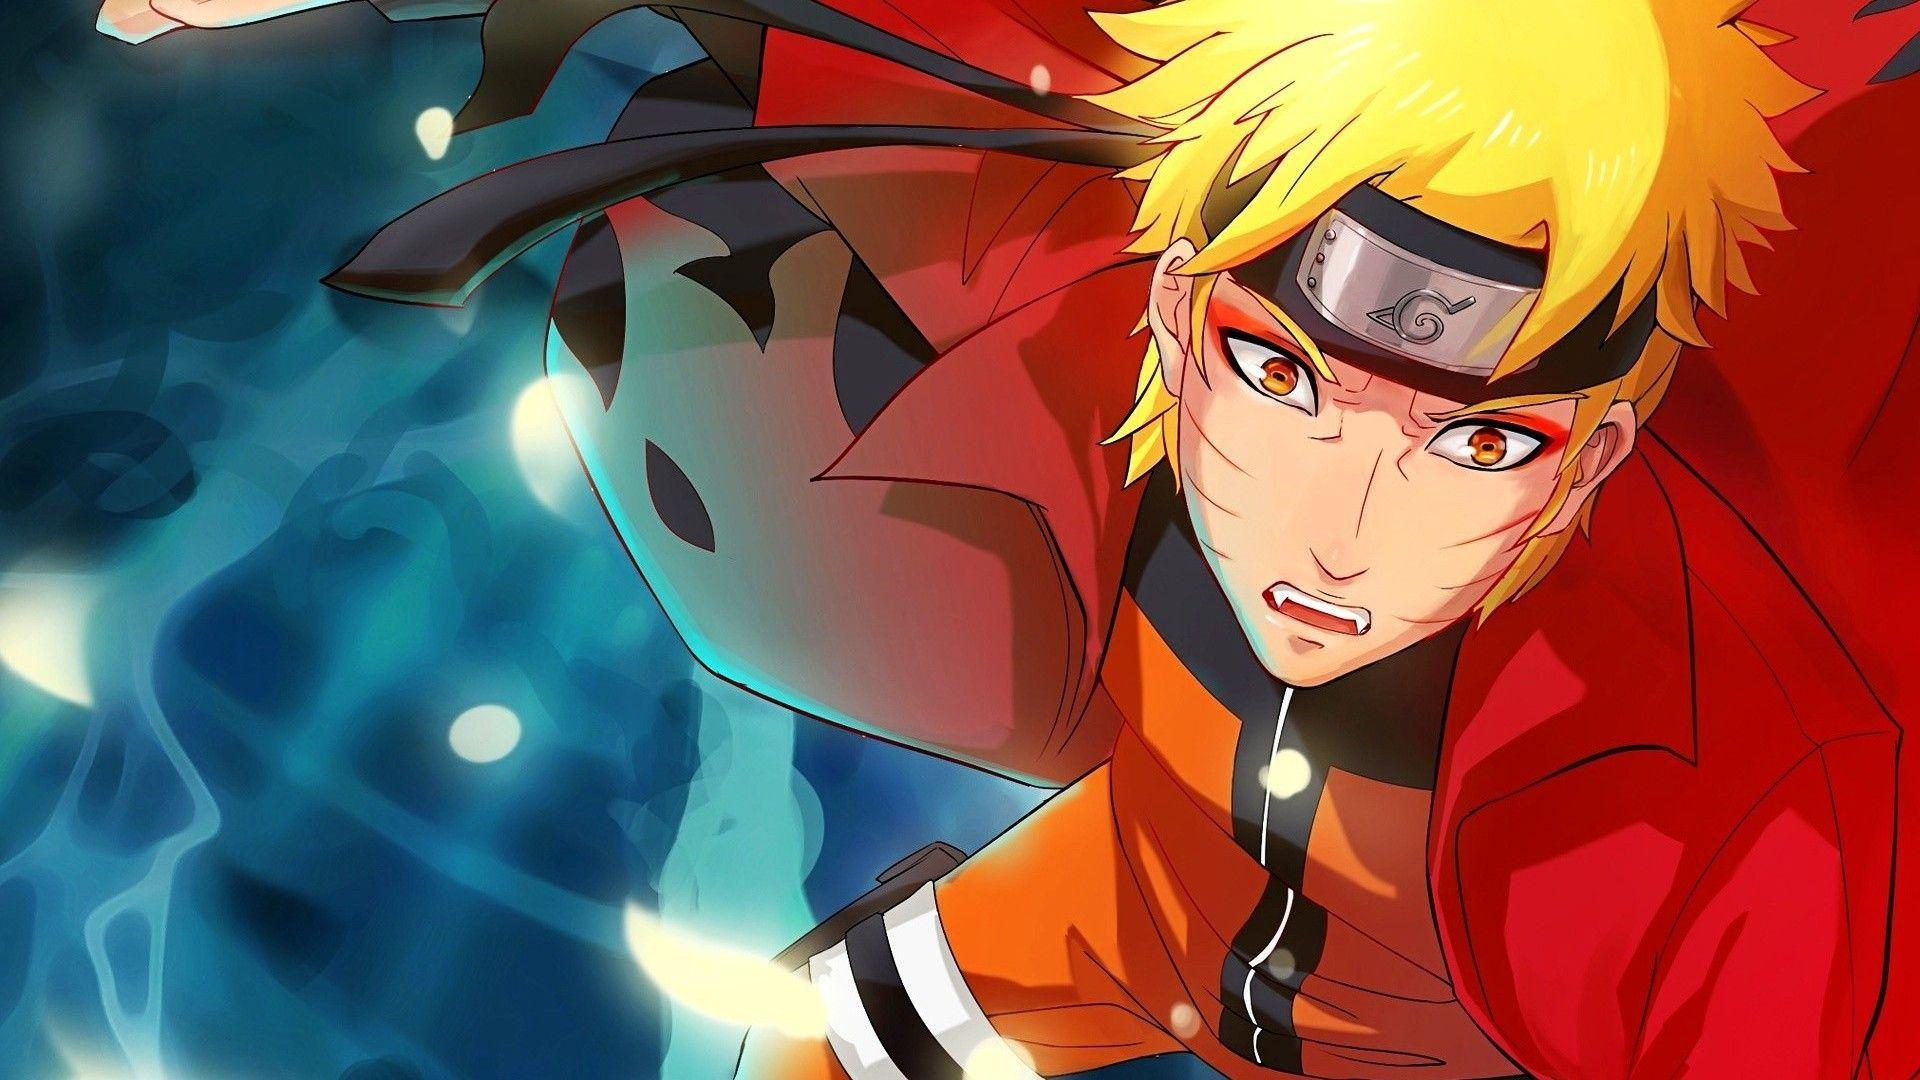 Wallpaper Cartoon Naruto Cool Collections Of Anime Wallpaper